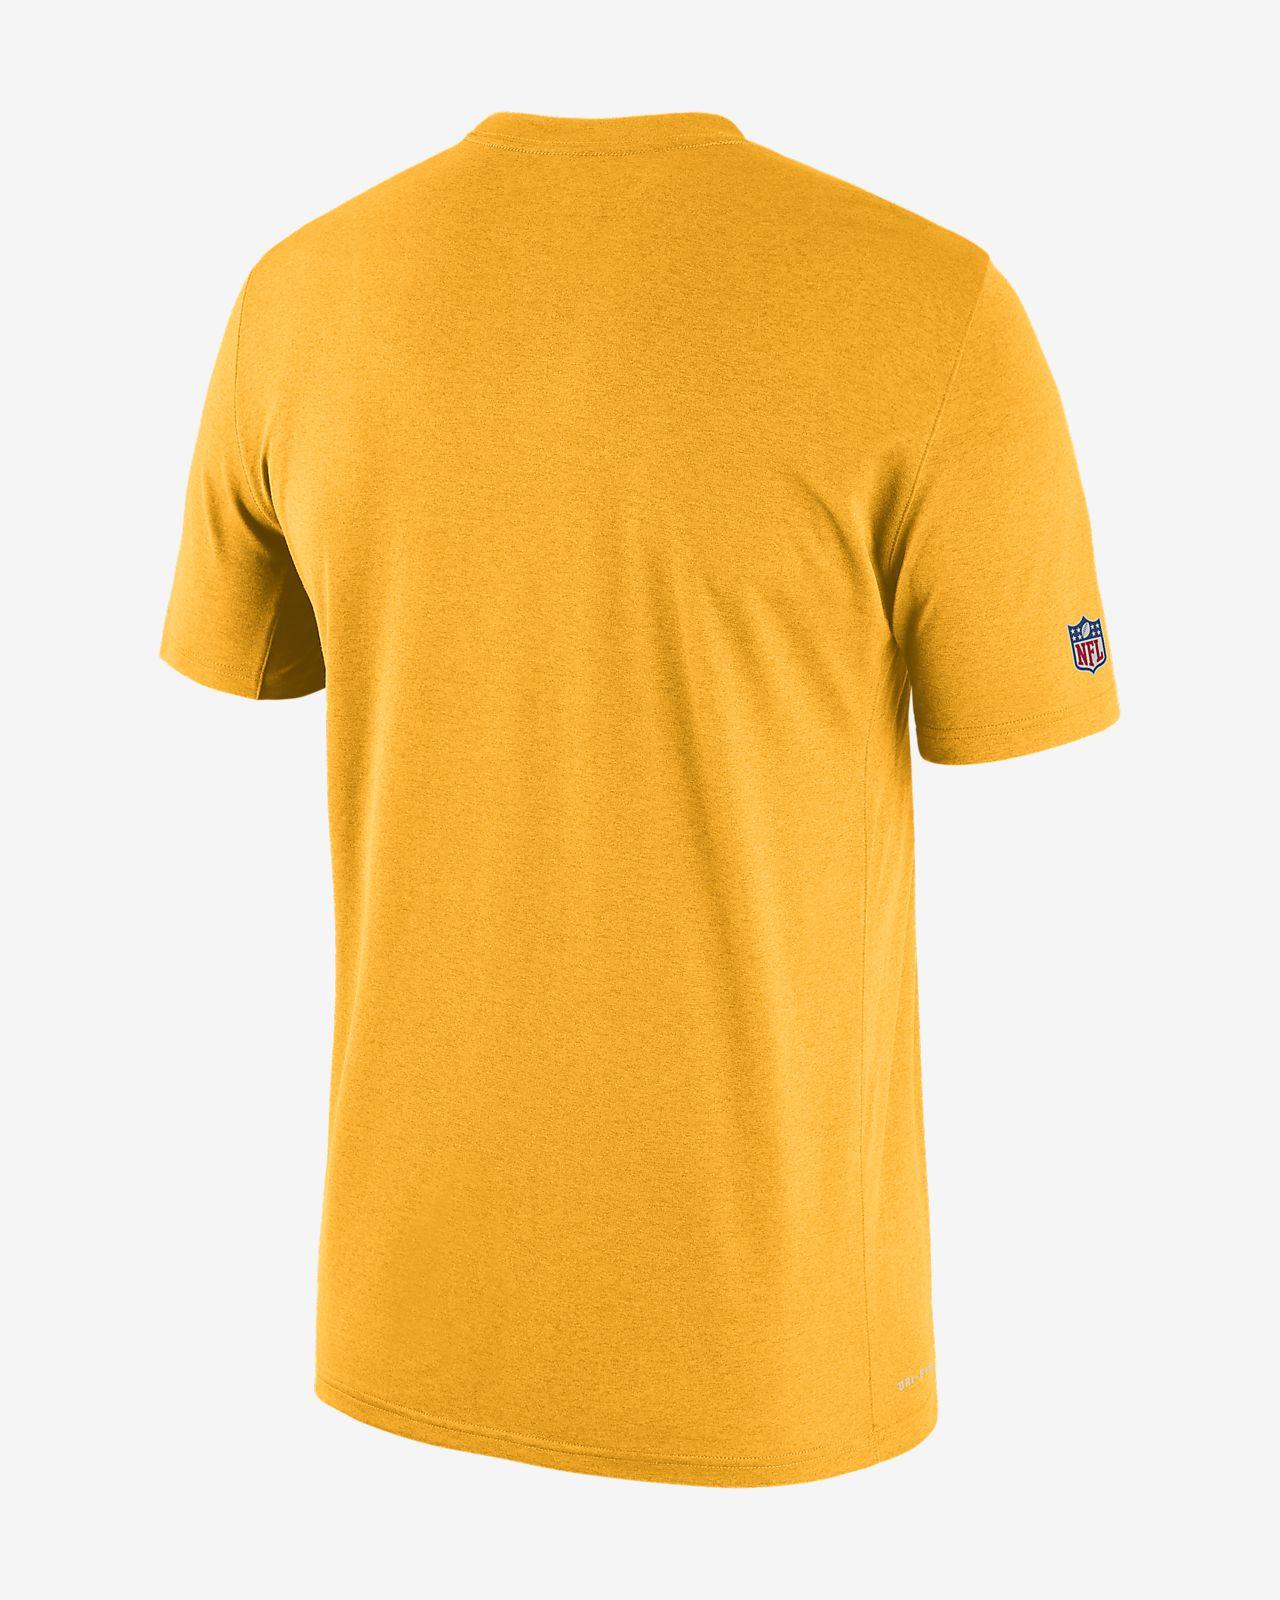 e3bce0fa8 Nike Dri-FIT Legend Seismic (NFL Steelers) Men s T-Shirt. Nike.com LU